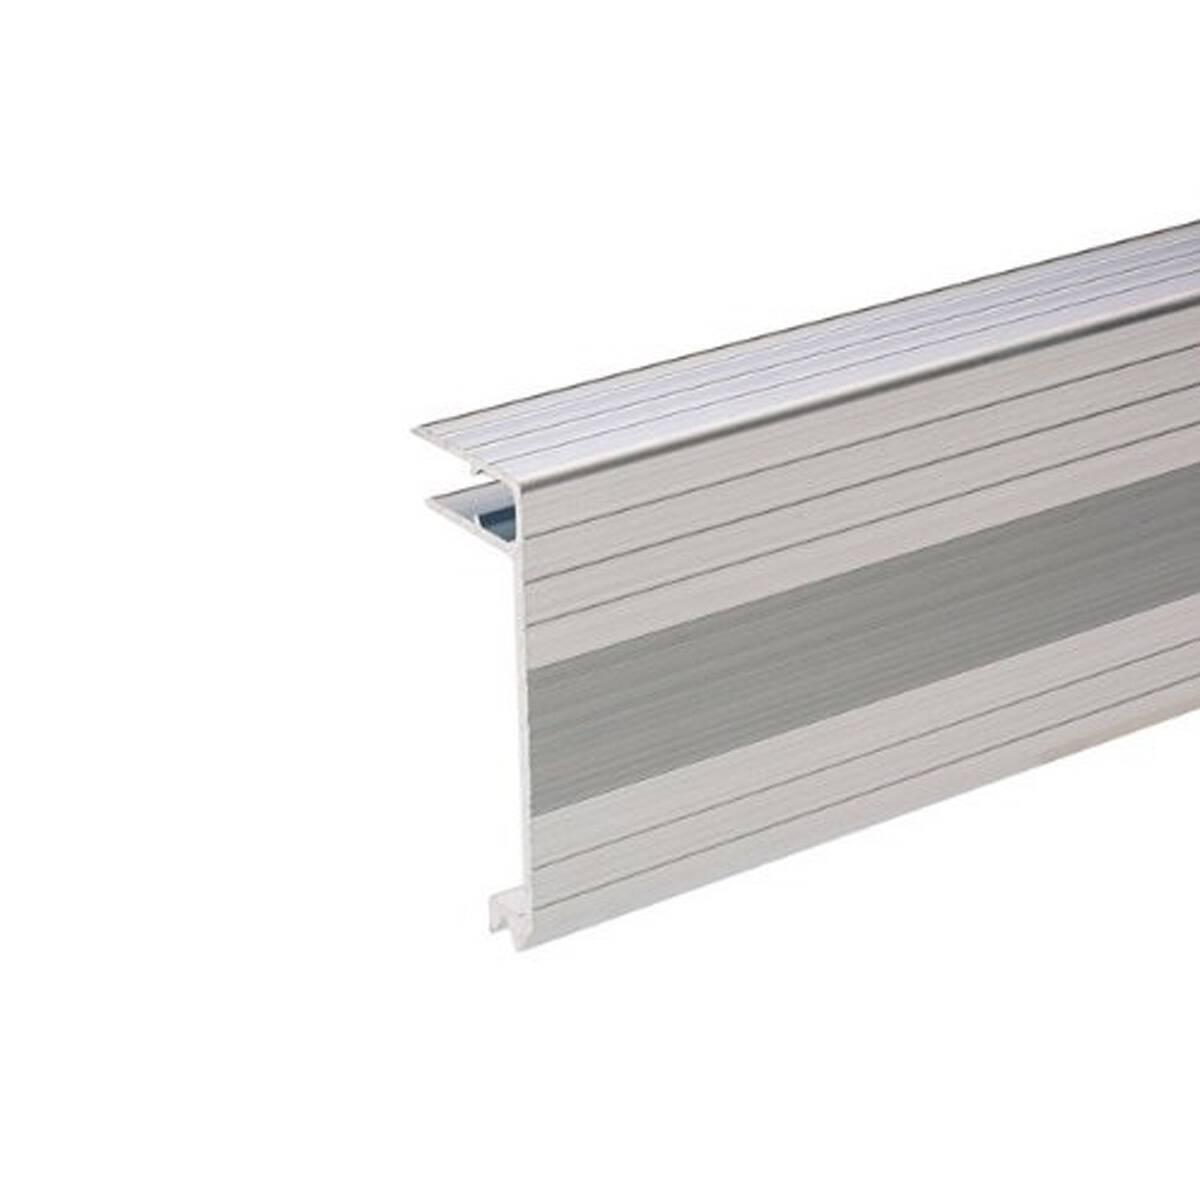 adam hall 6113 aluminium deckelrahmen 75 mm 9 5 mm einschub. Black Bedroom Furniture Sets. Home Design Ideas